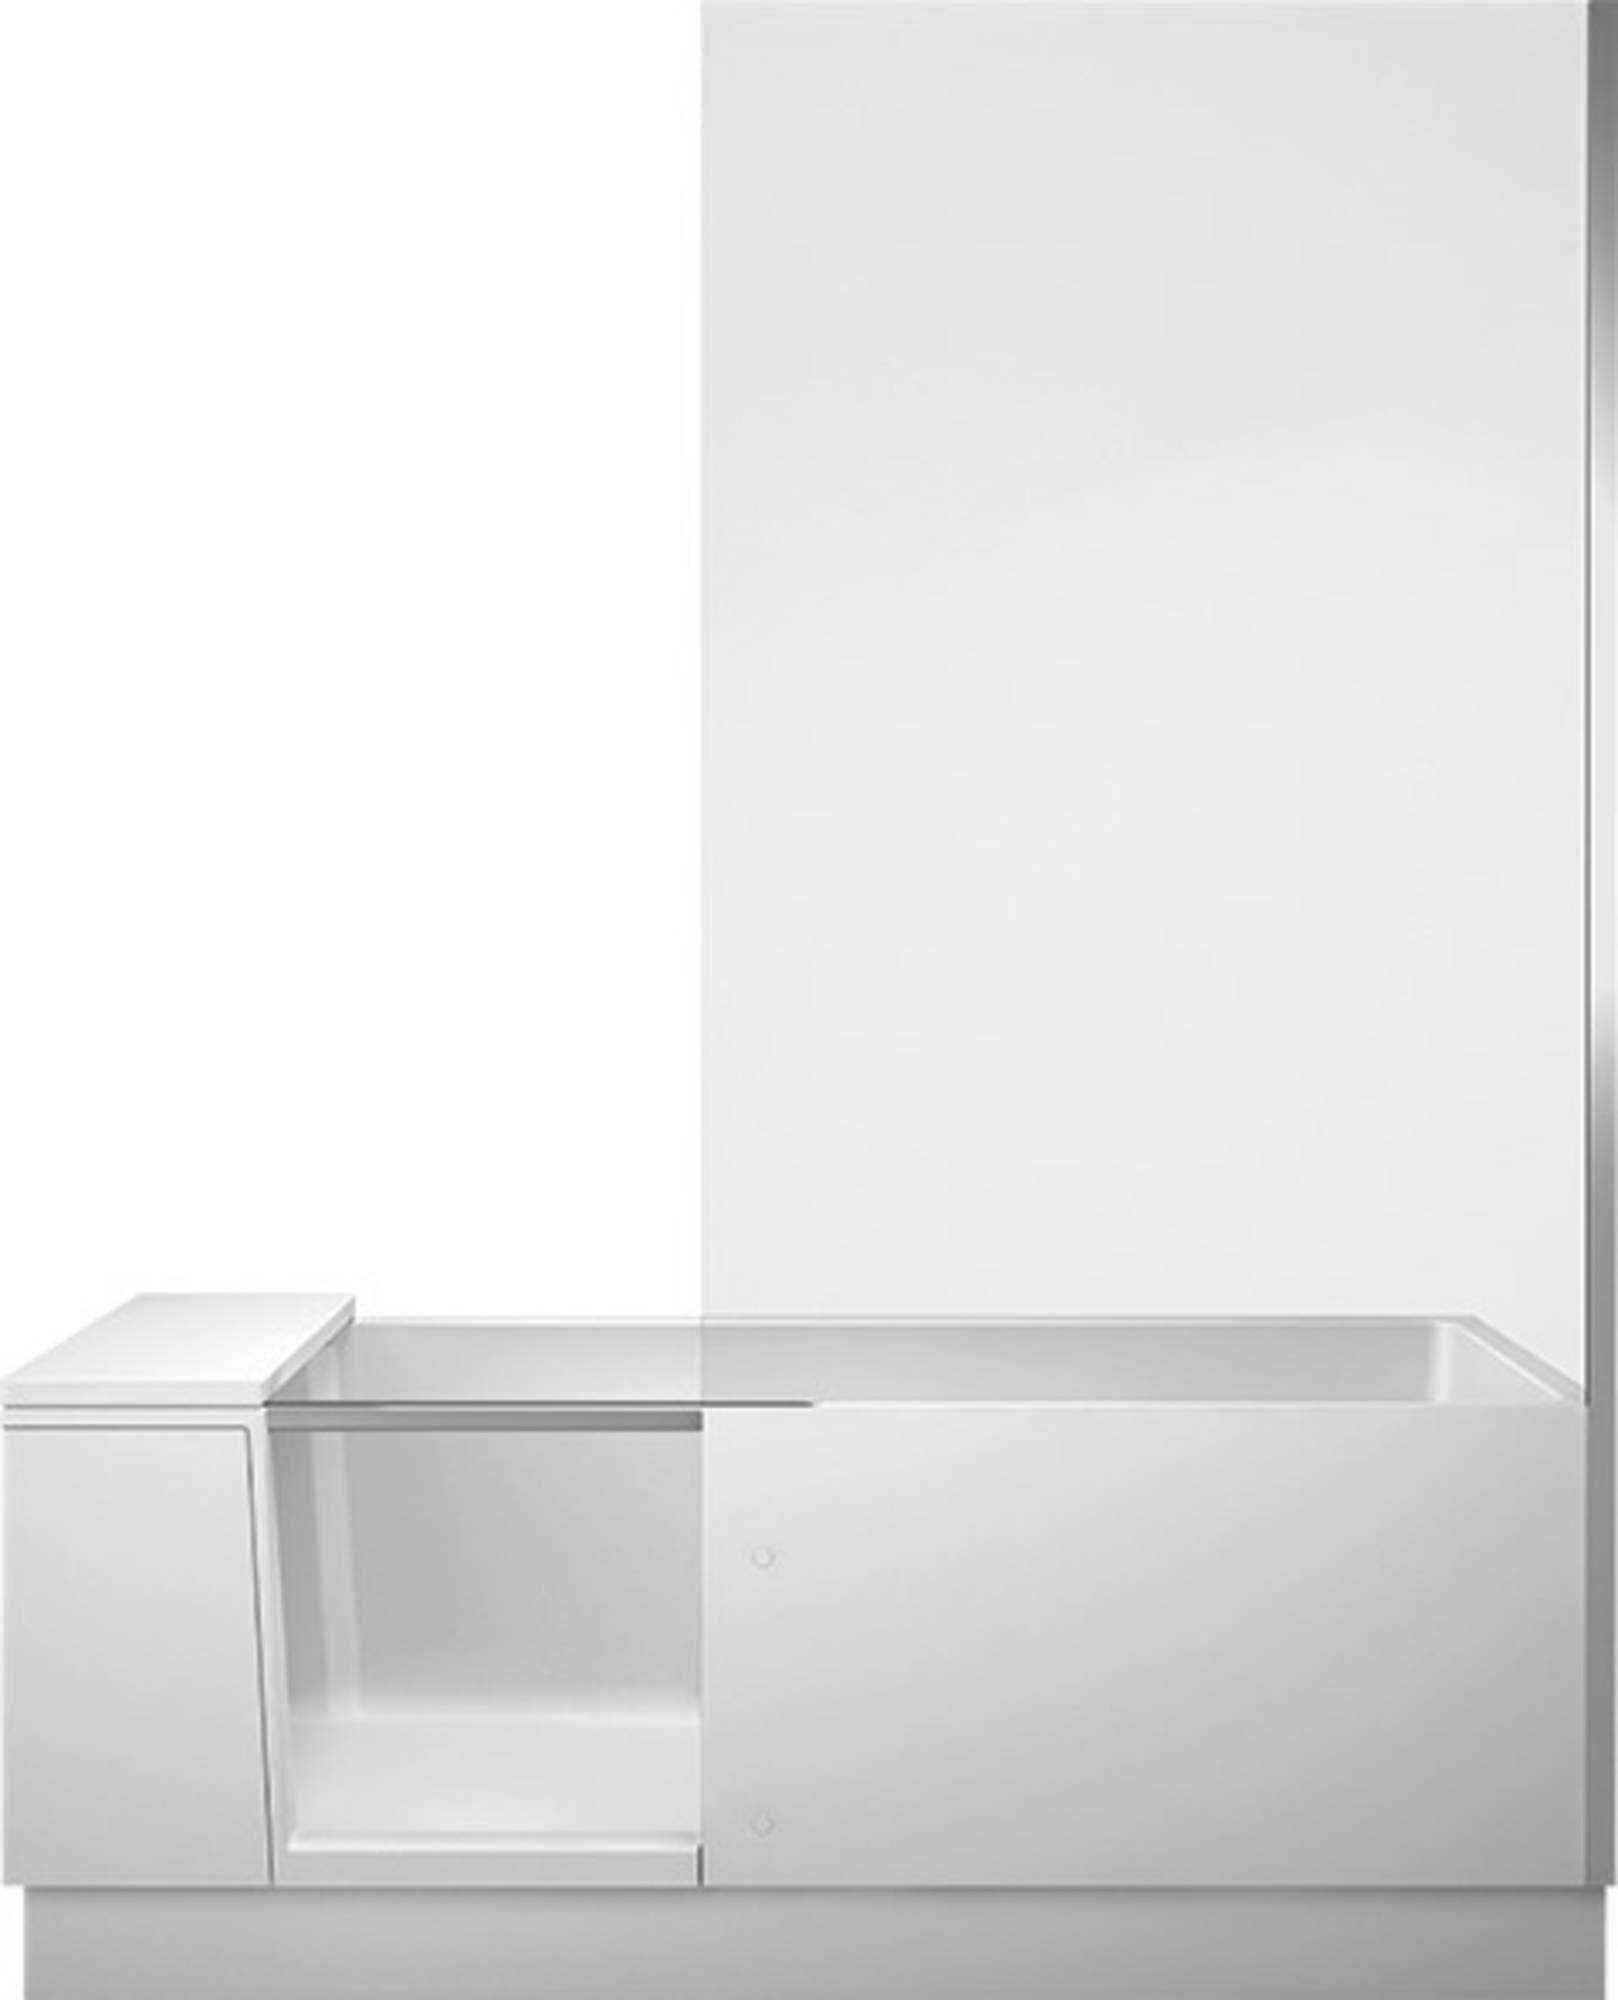 Duravit Shower + Bath Bad met gemonteerde deur rechts 170x75 cm Wit helder glas